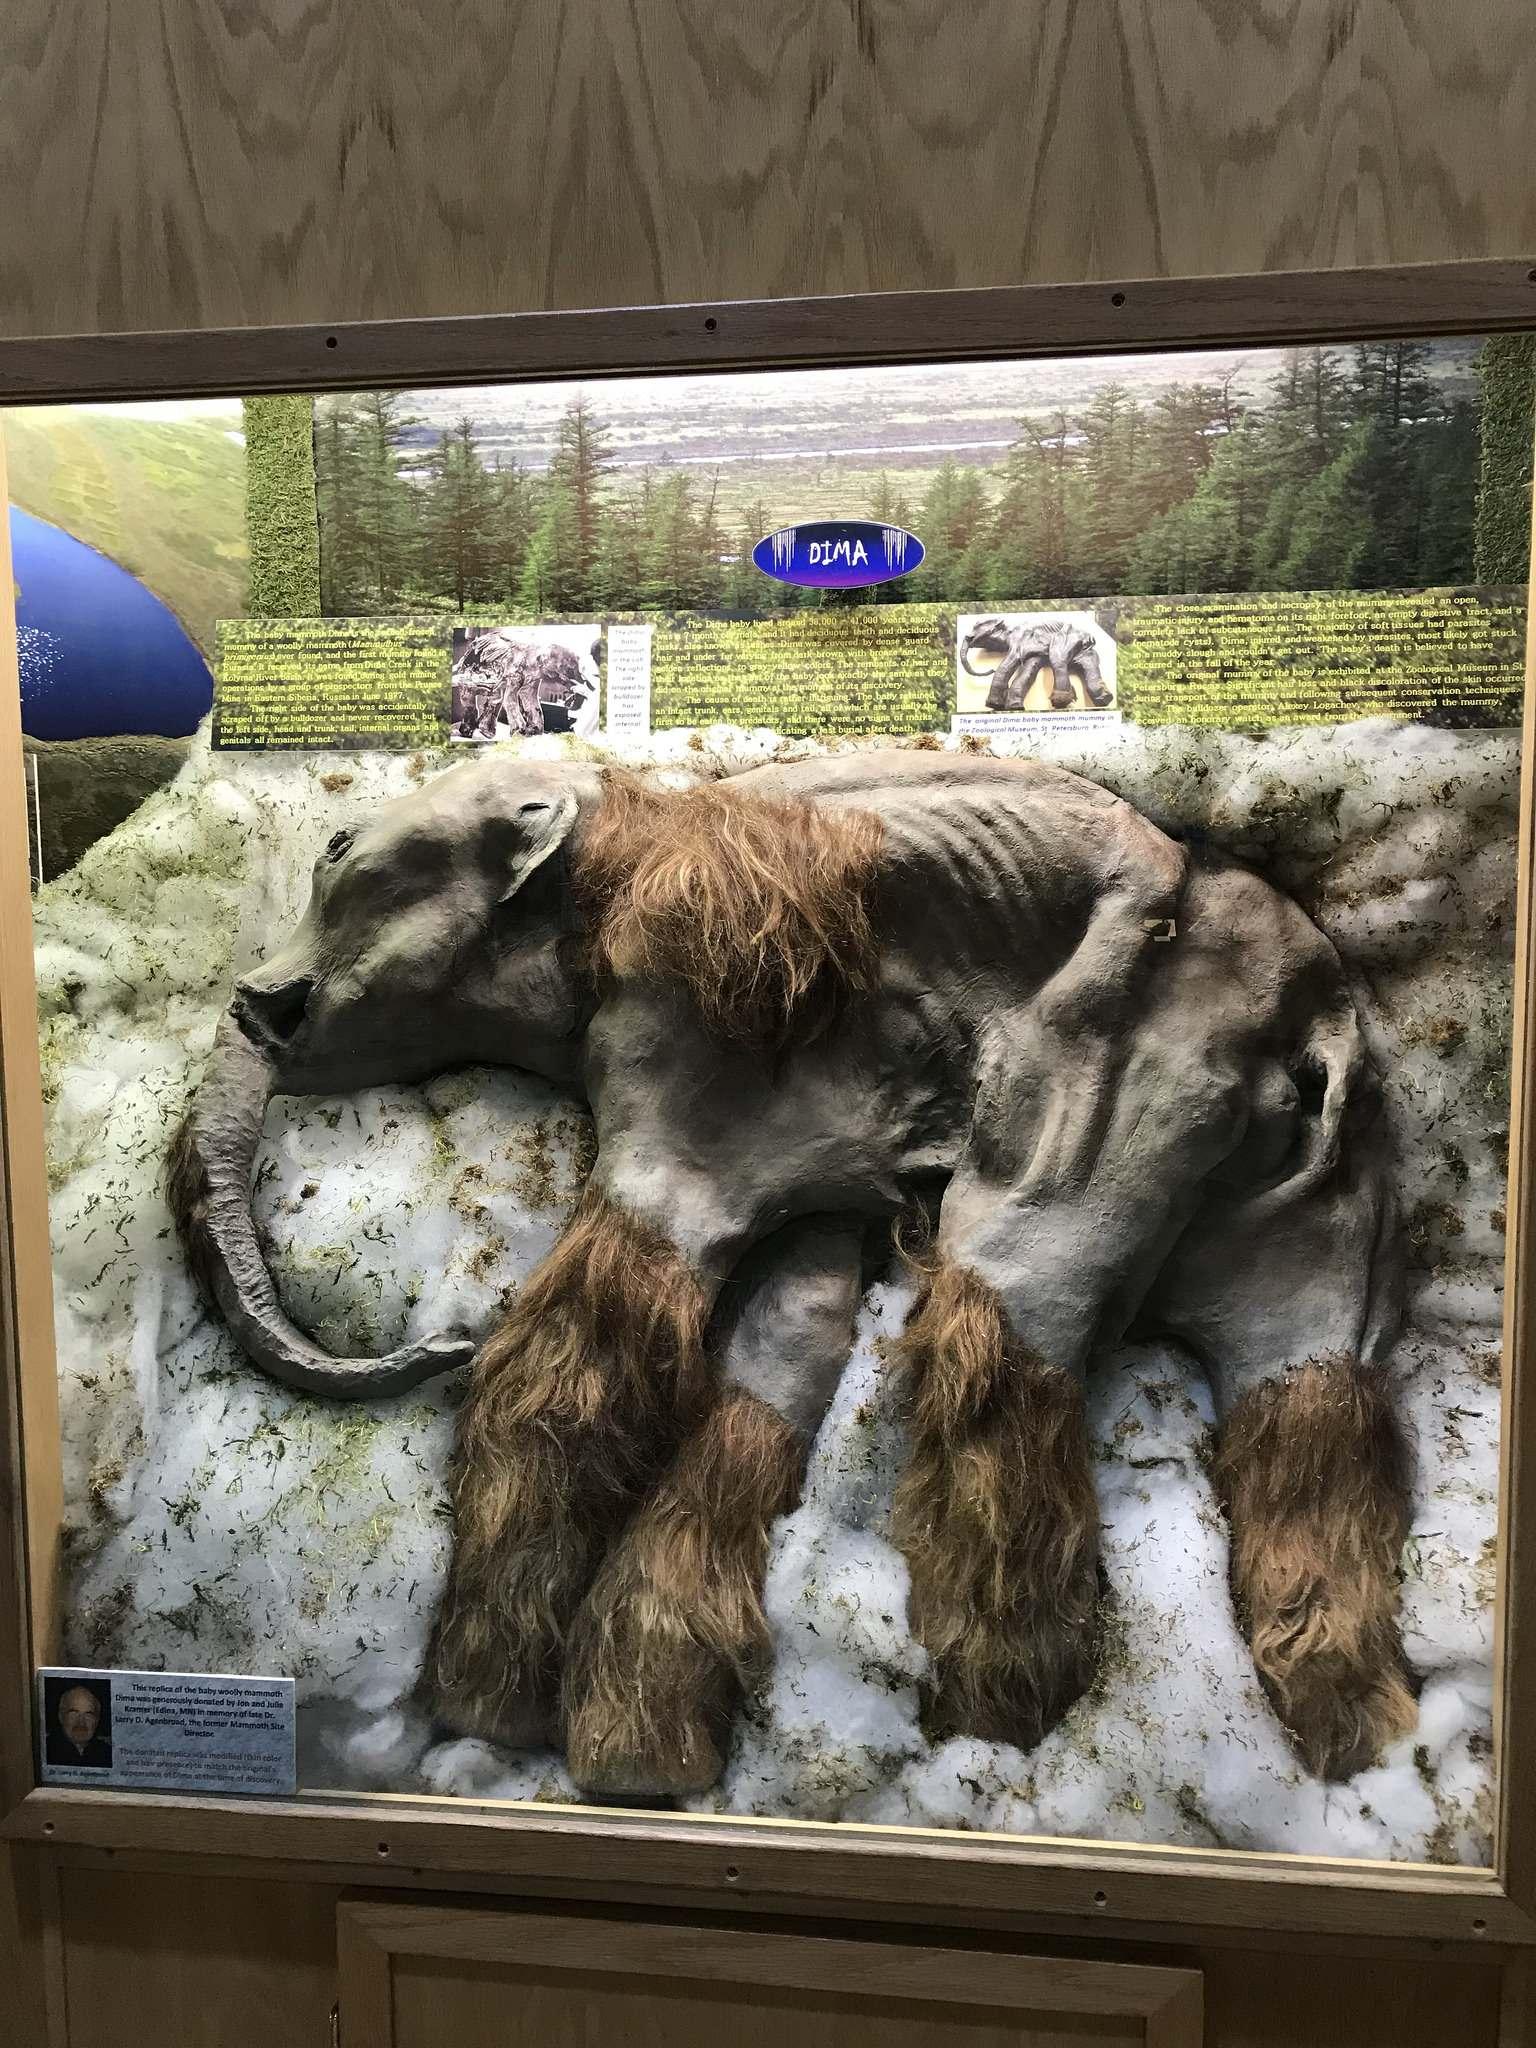 mammoth site1 Mammoth Site of Hot Springs in South Dakota